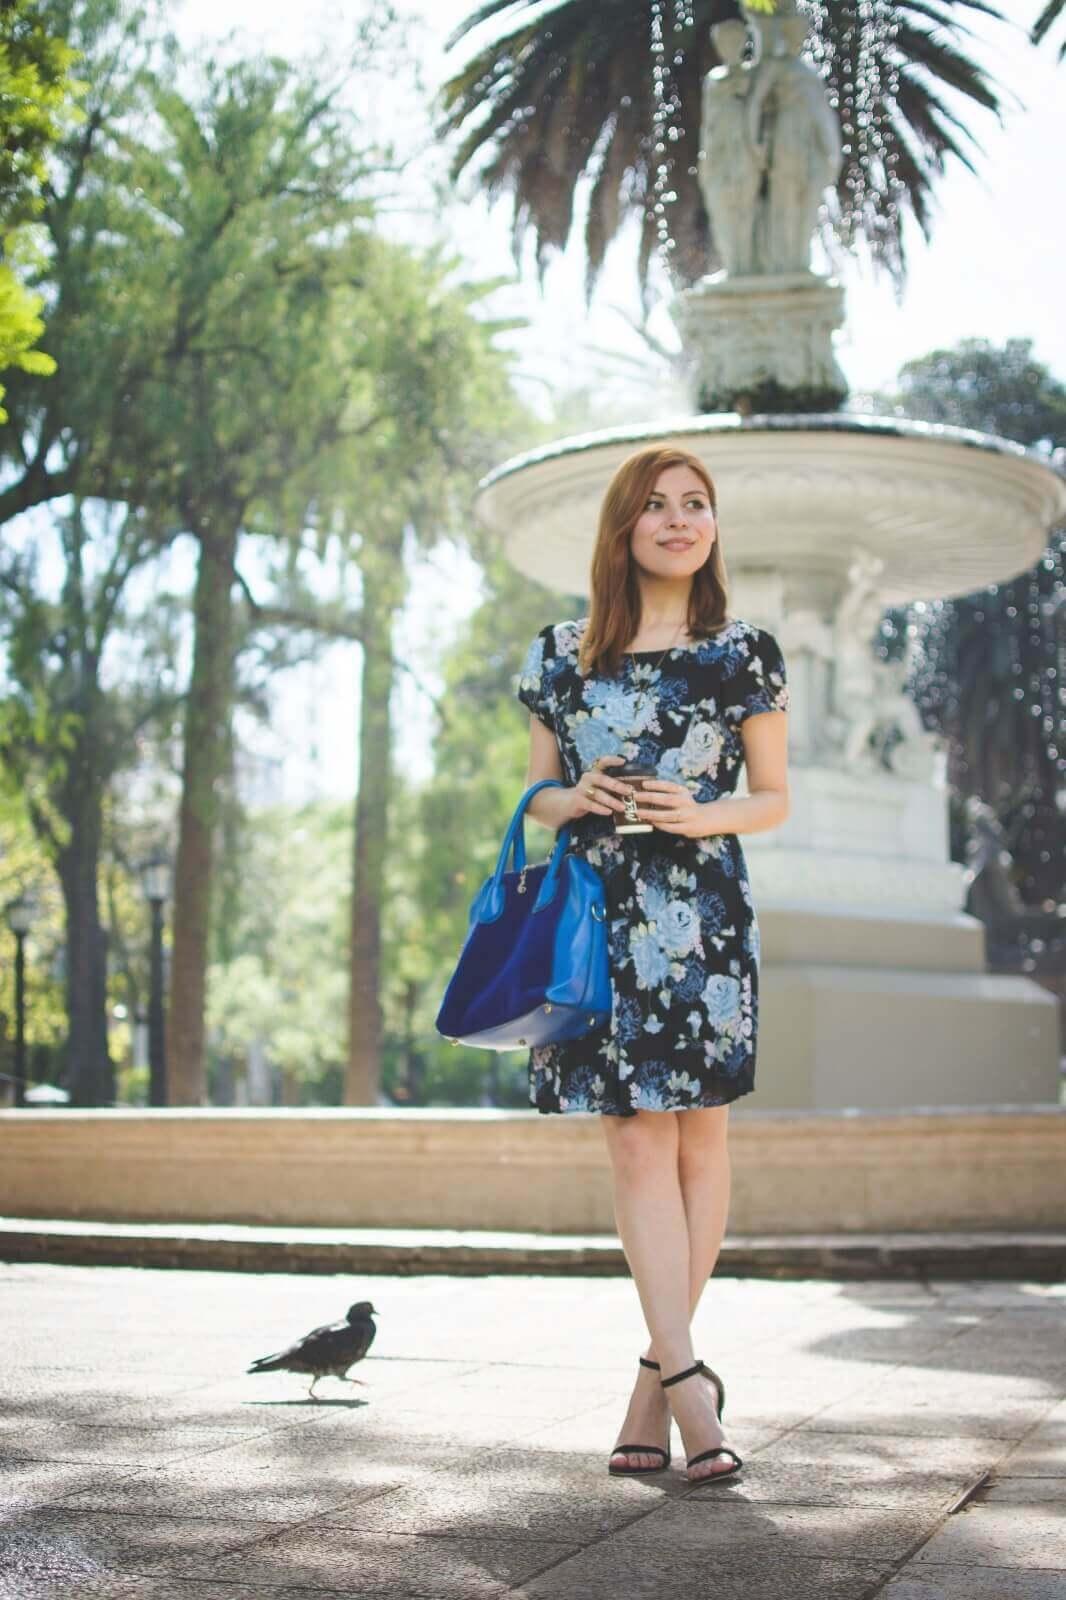 gamiss-black-strappy-sandals-blue-floral-dress-rosegal-cobalt-blue-tote-bag-deborah-ferrero-style-by-deb07